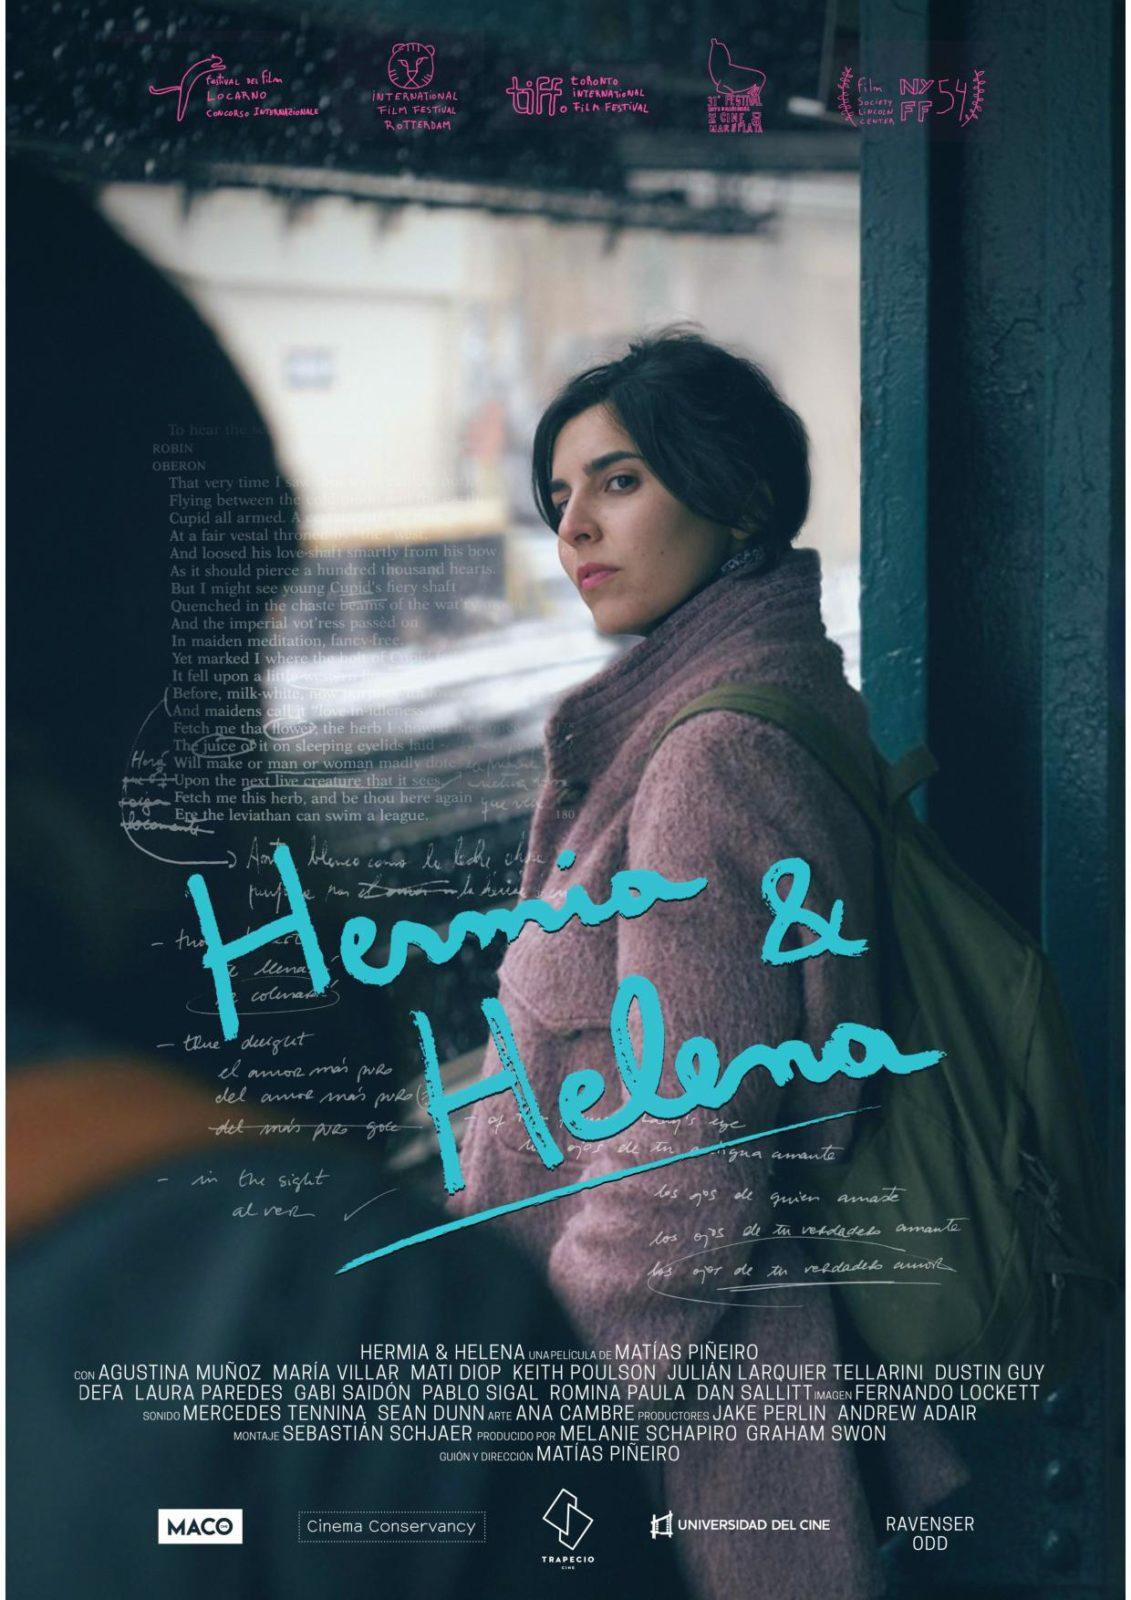 Hermia y Helena